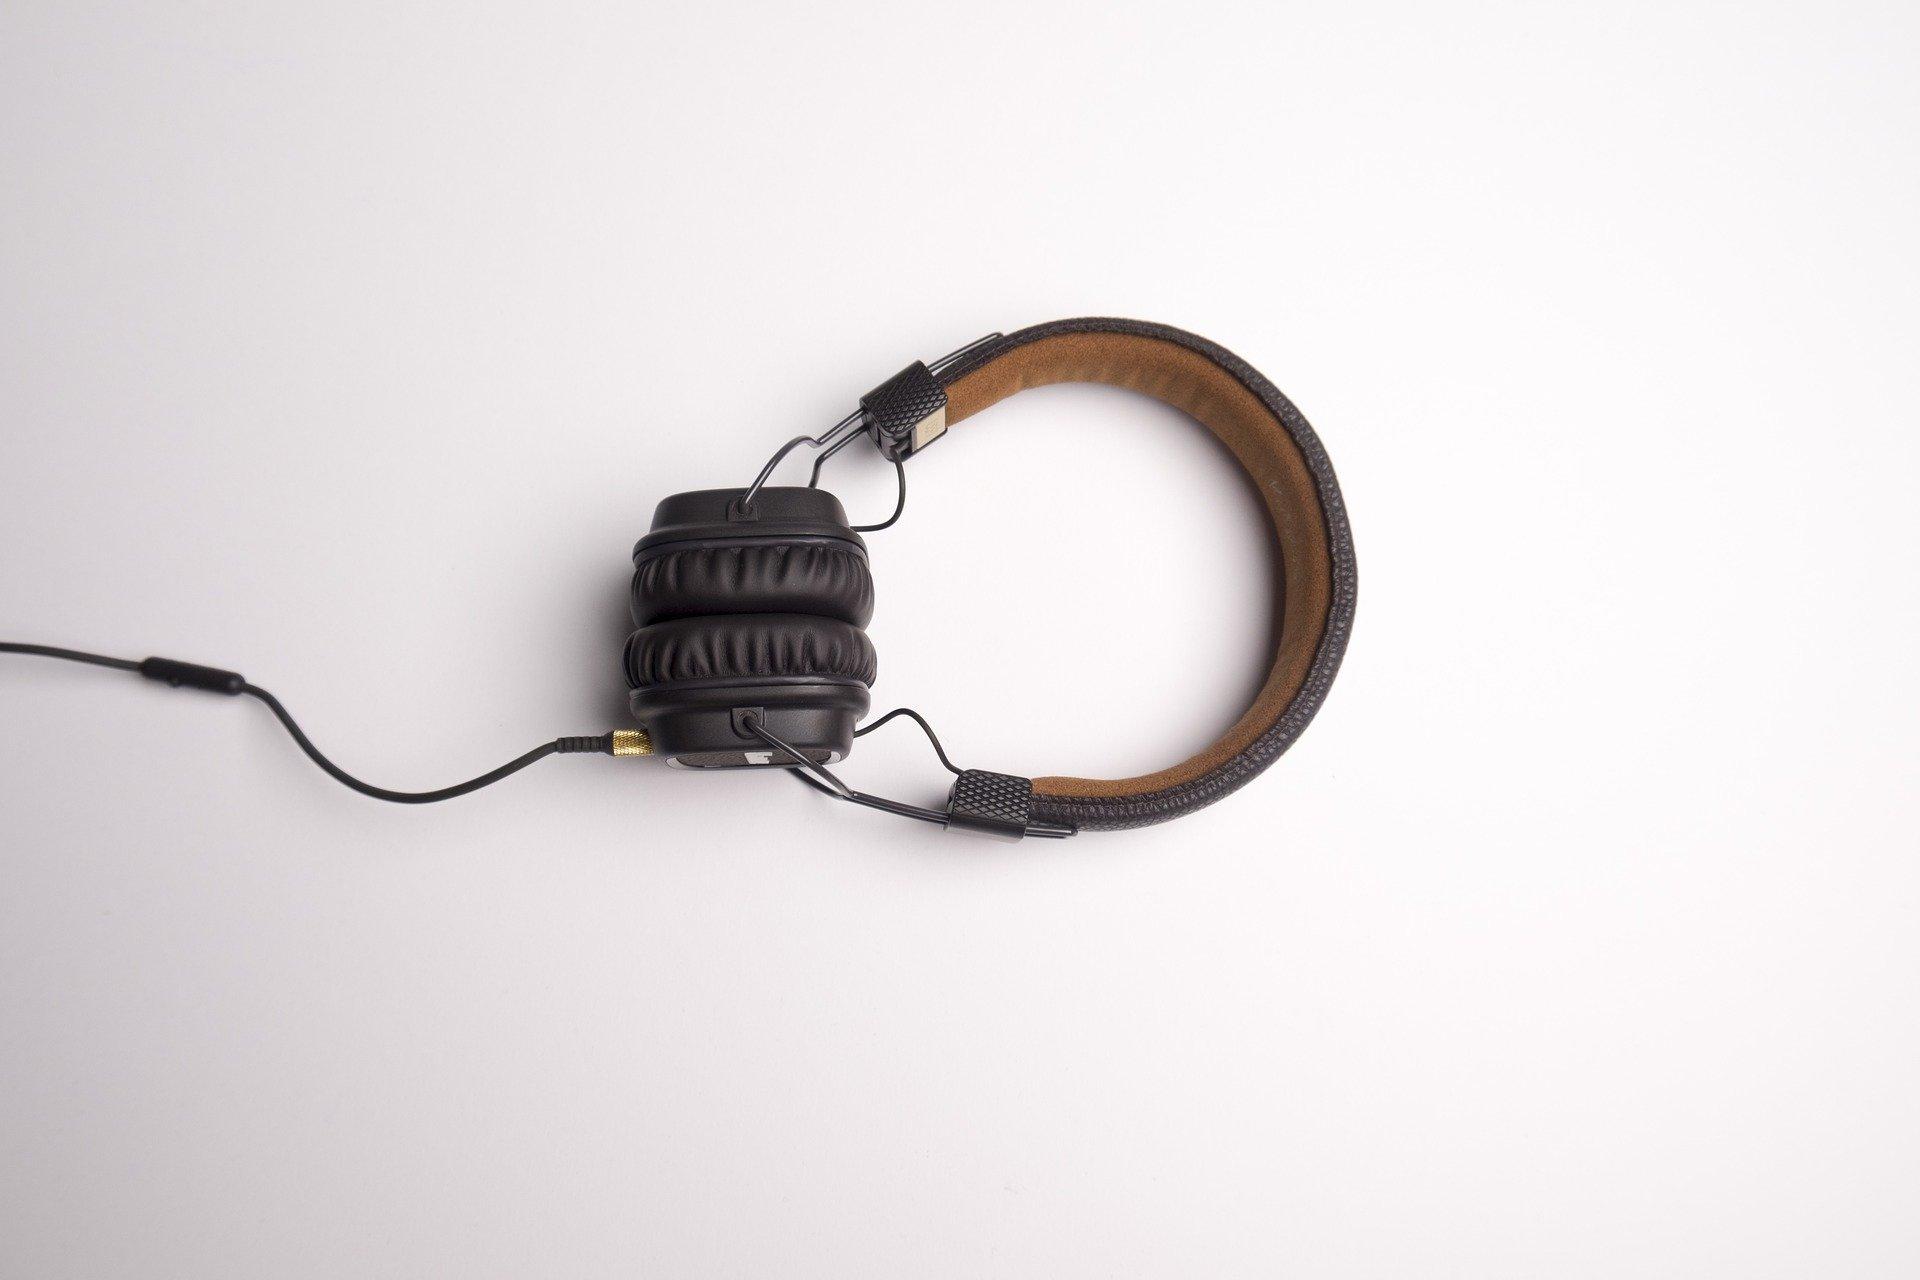 headphone-1868612_1920